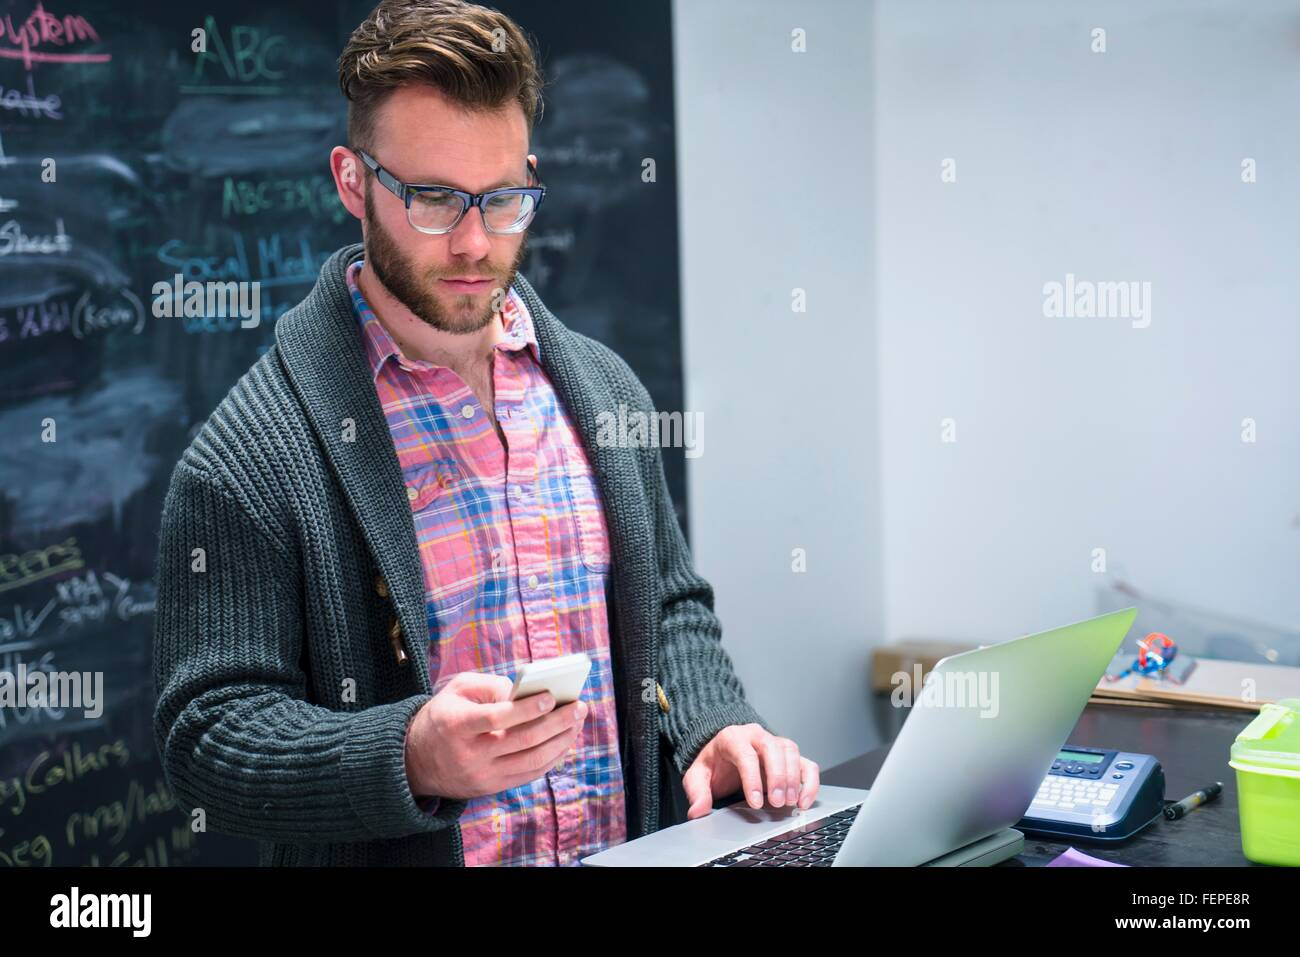 Junger Mann Arbeitsplatz mit Laptop, Smartphone betrachten Stockbild